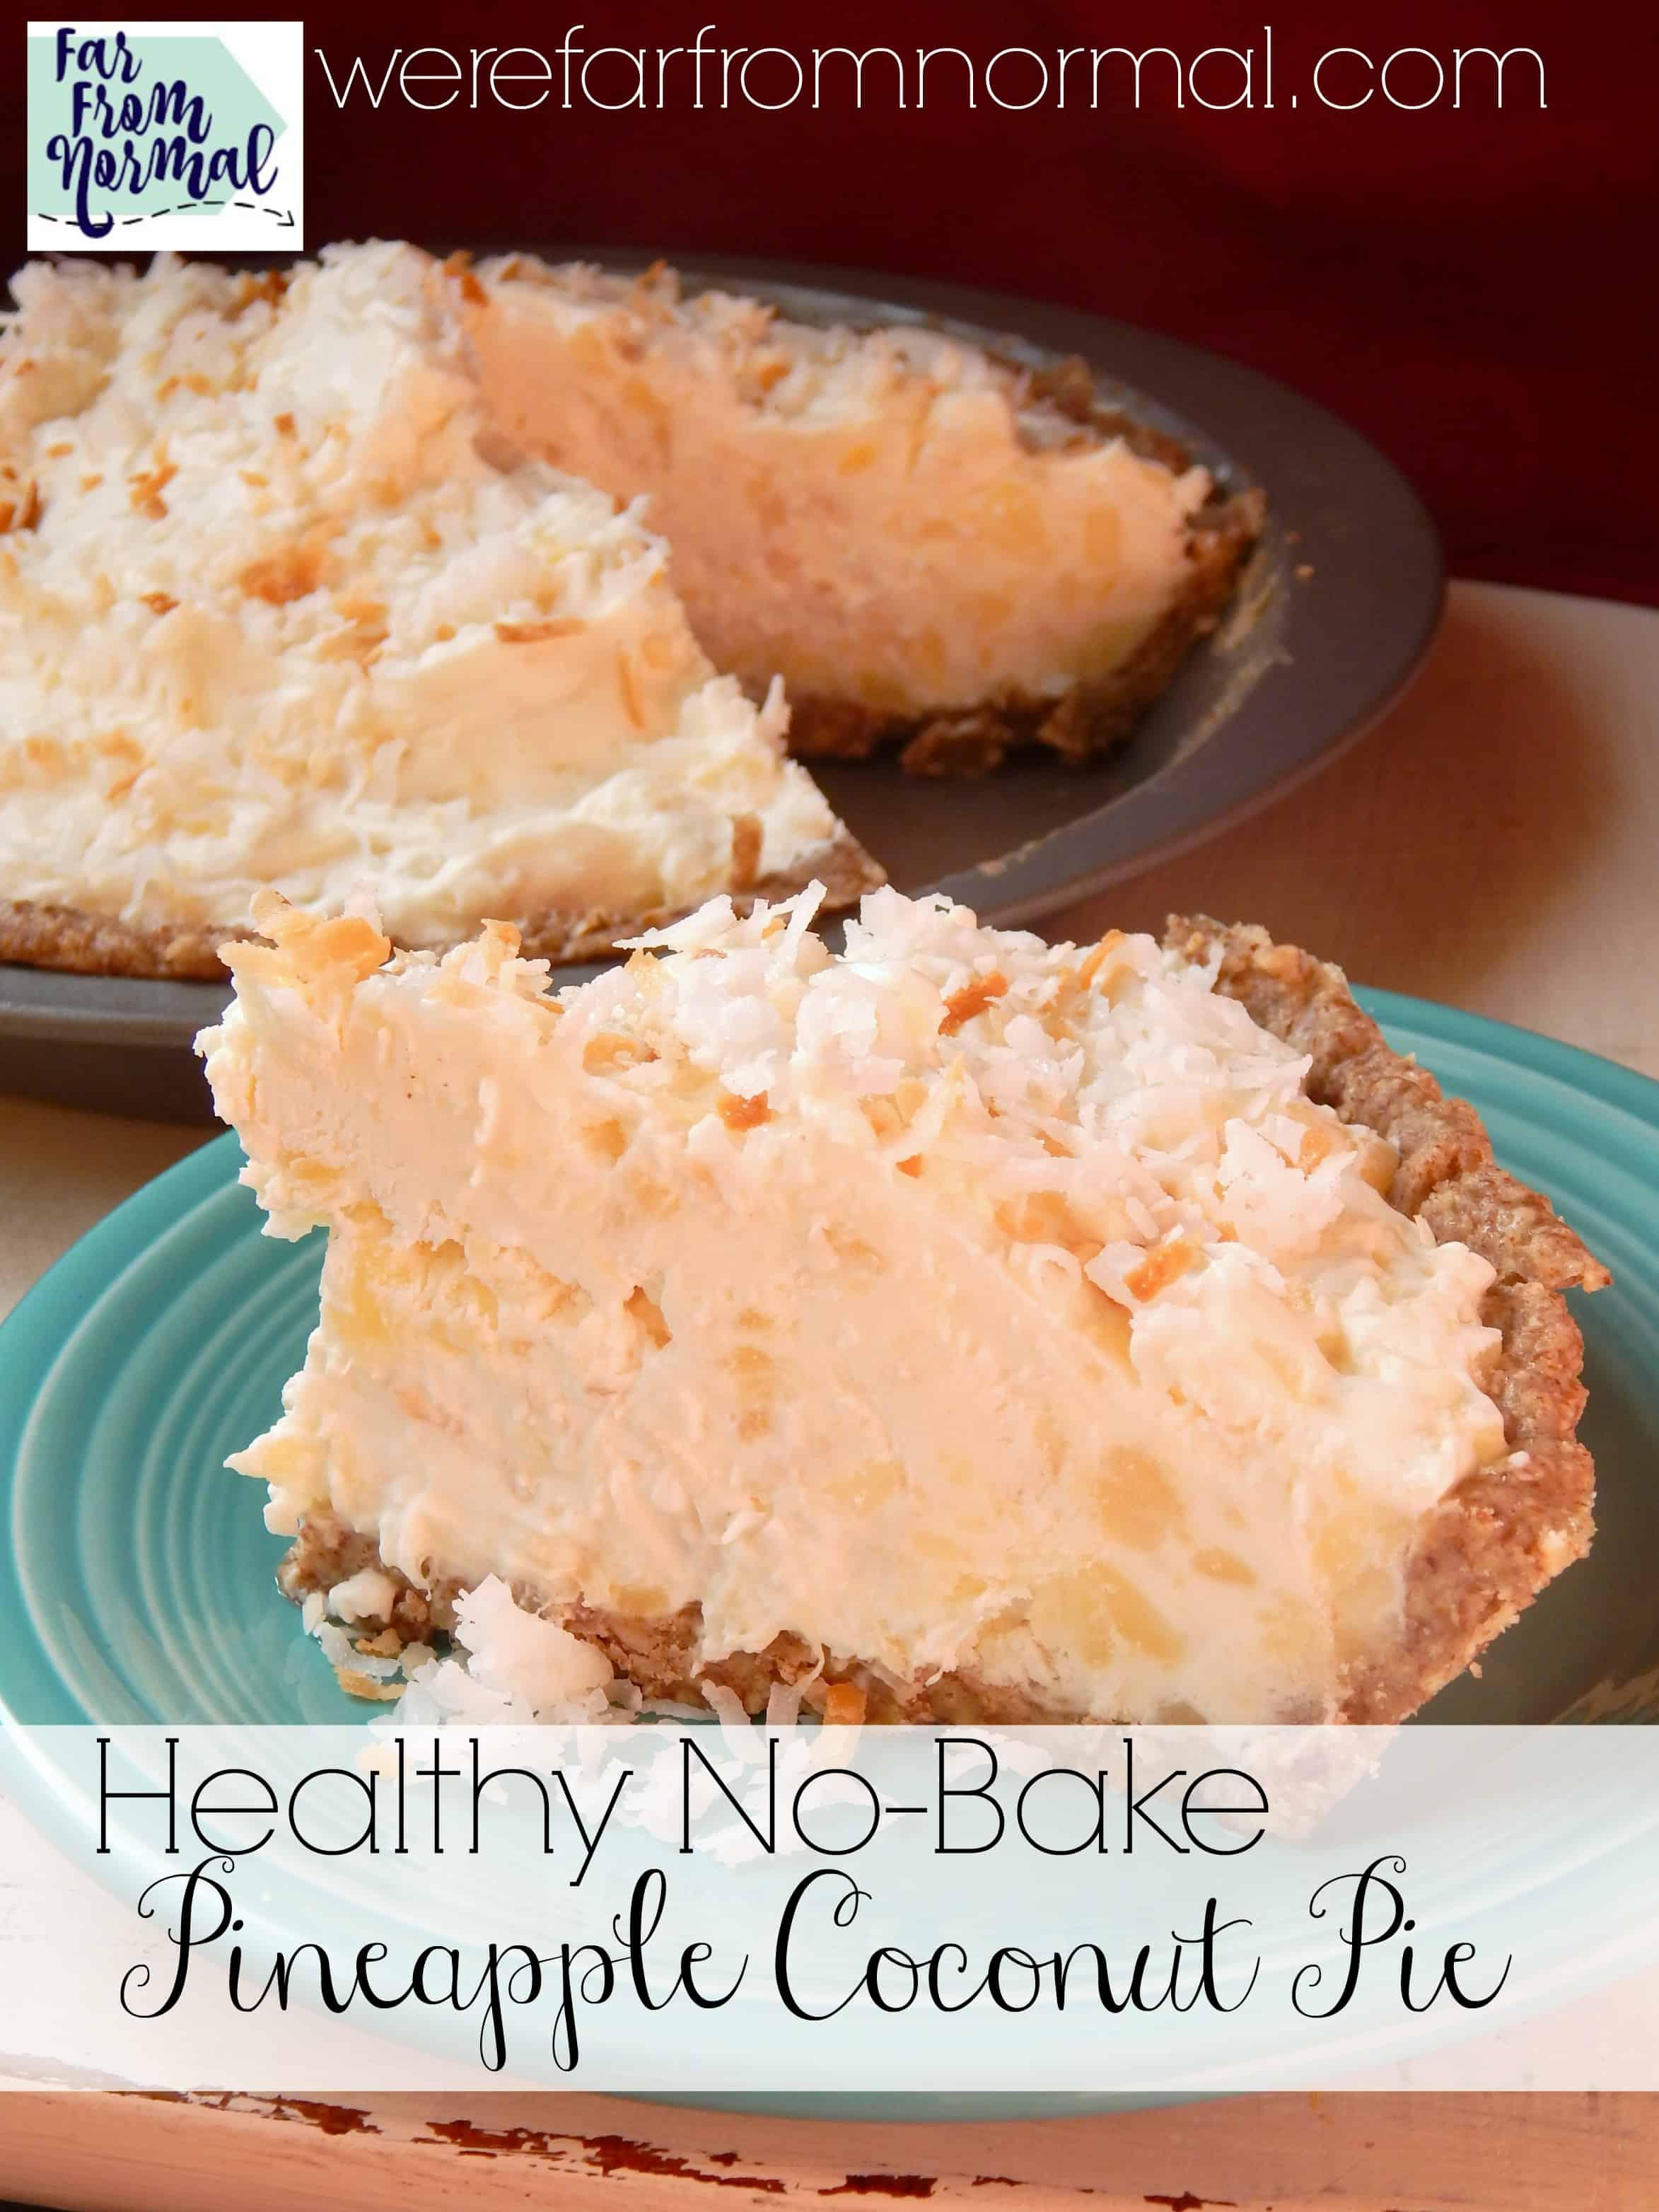 Healthy No-Bake Pineapple Coconut Pie